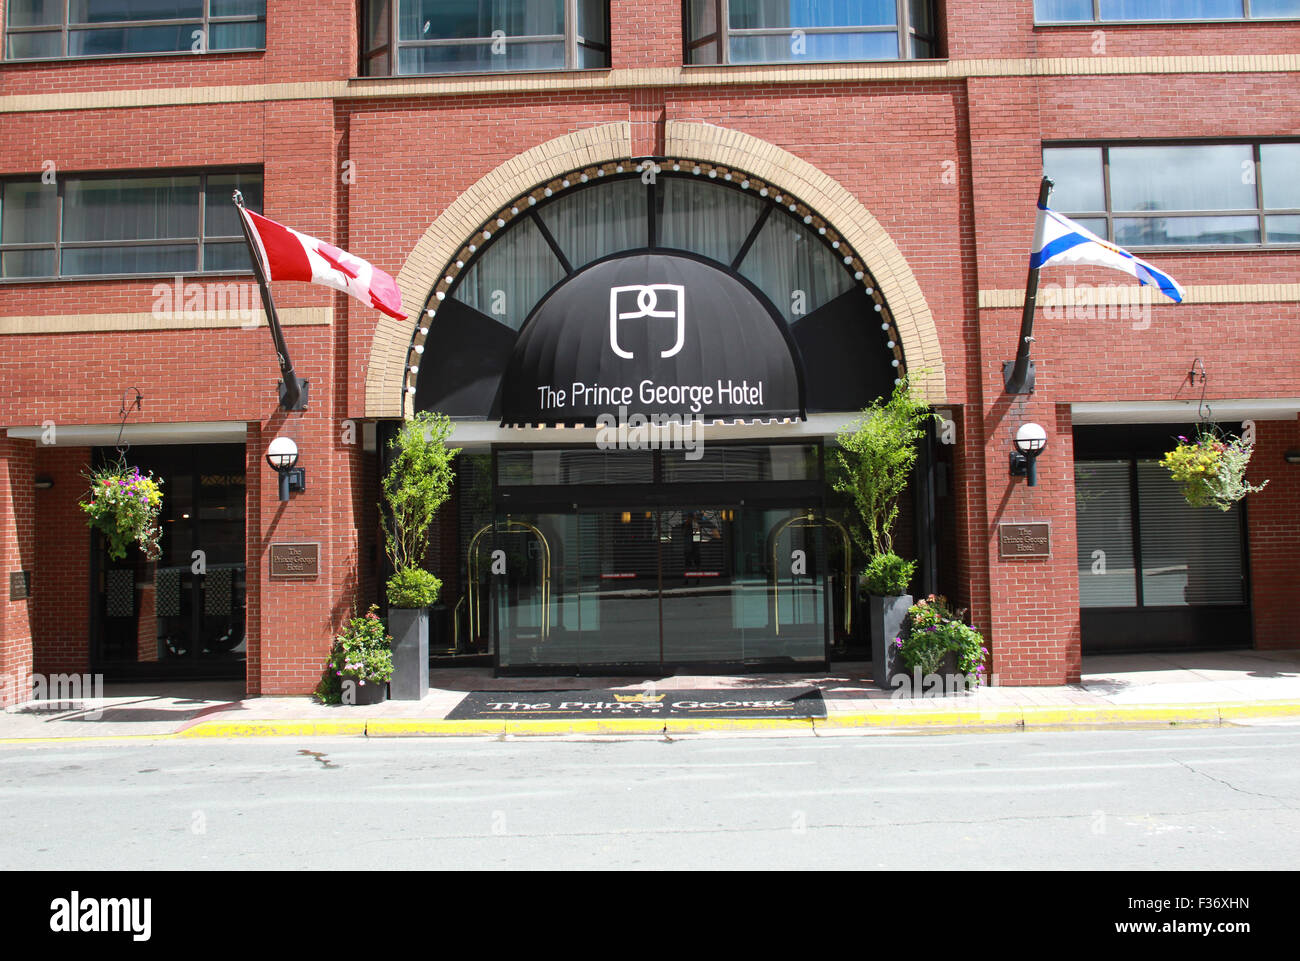 Prince George Casino Hotel